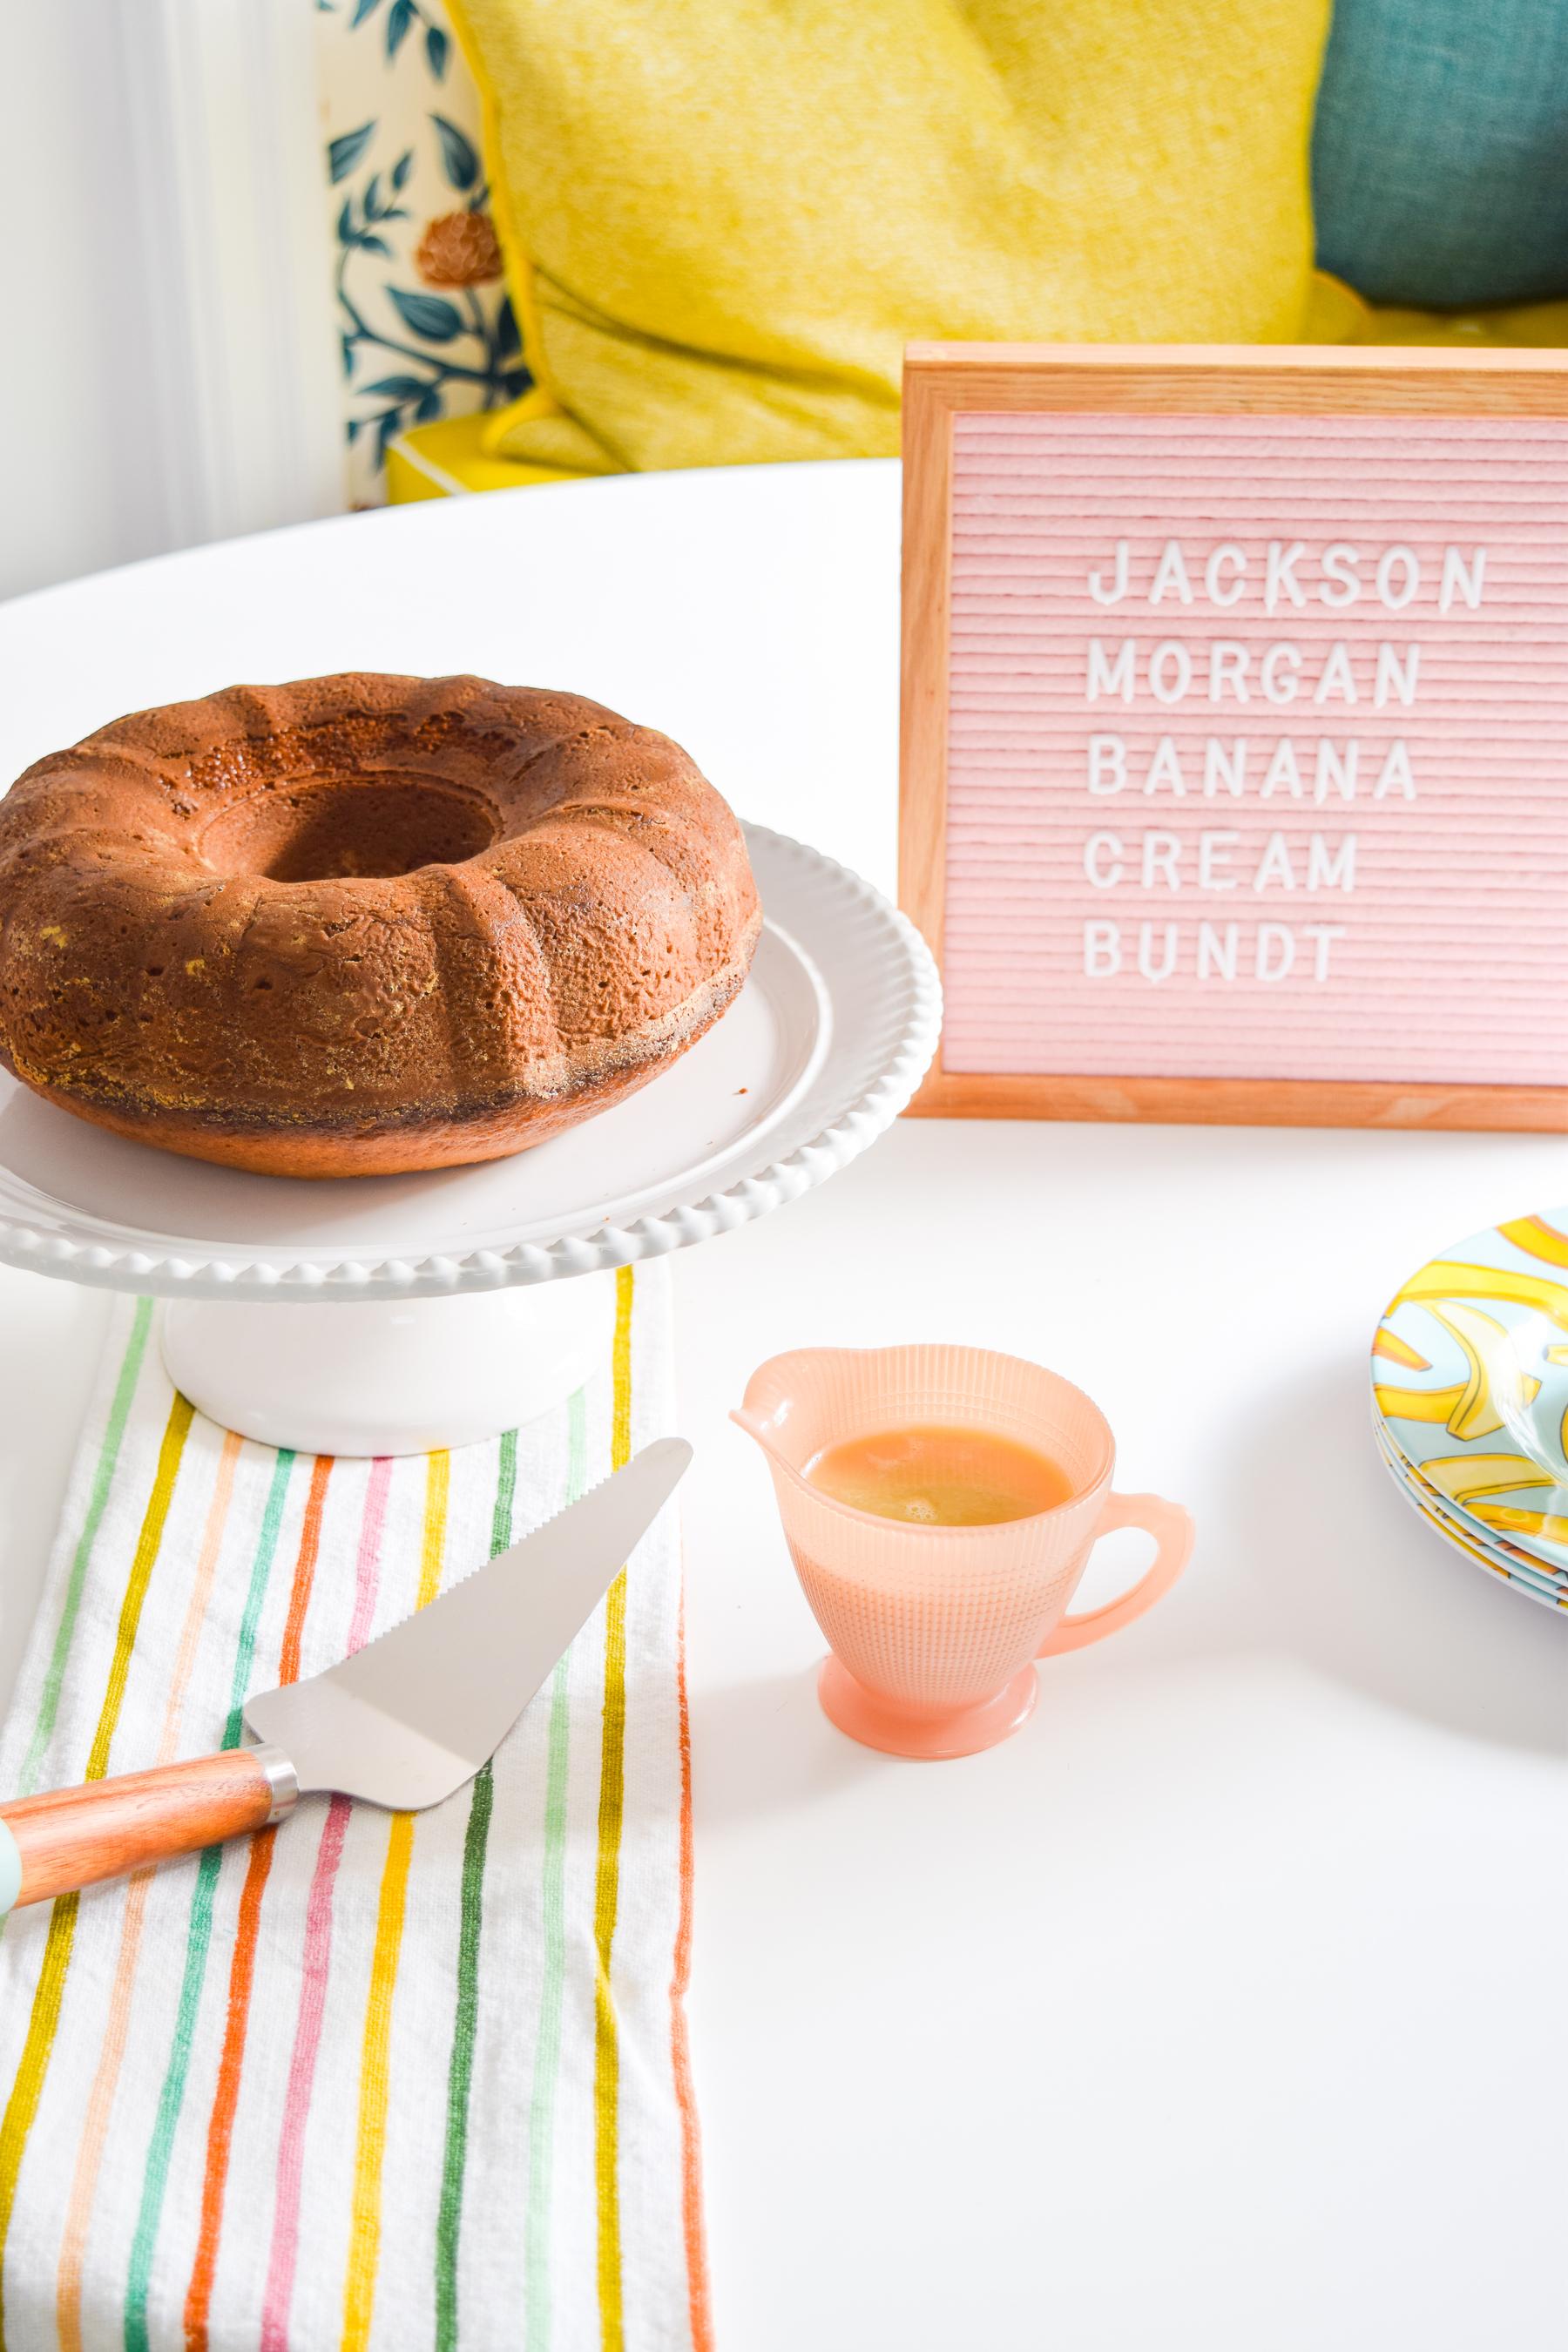 A Whiskey Banana Cream Bundt Cake is easier to make than you'd think (cake mix + Jackson Morgan Banana Pudding Cream), and tastes like creamy banana pudding goodness.